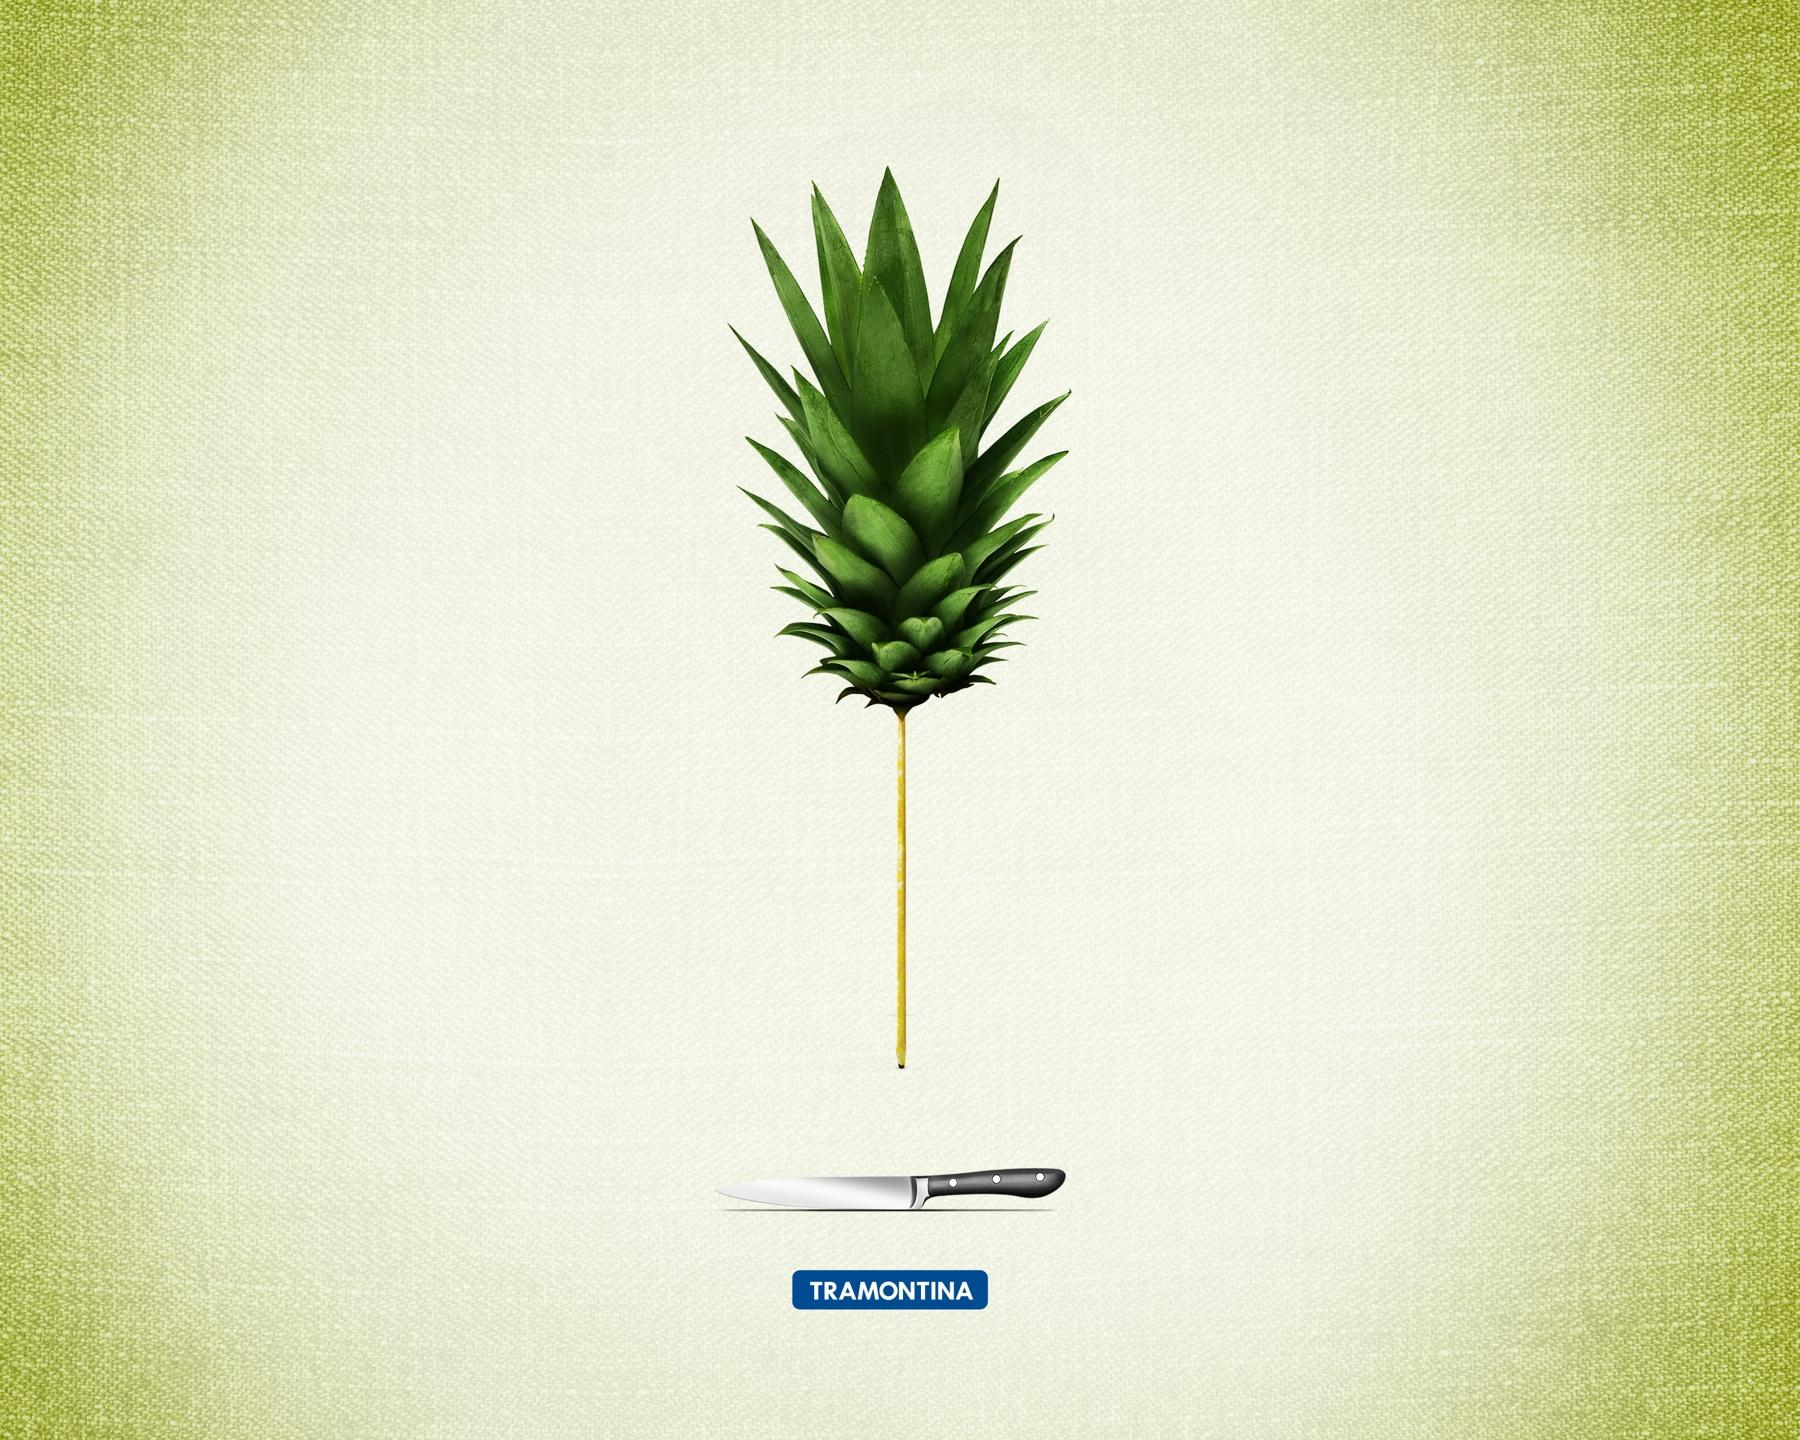 Tramontina Print Ad -  Pineapple